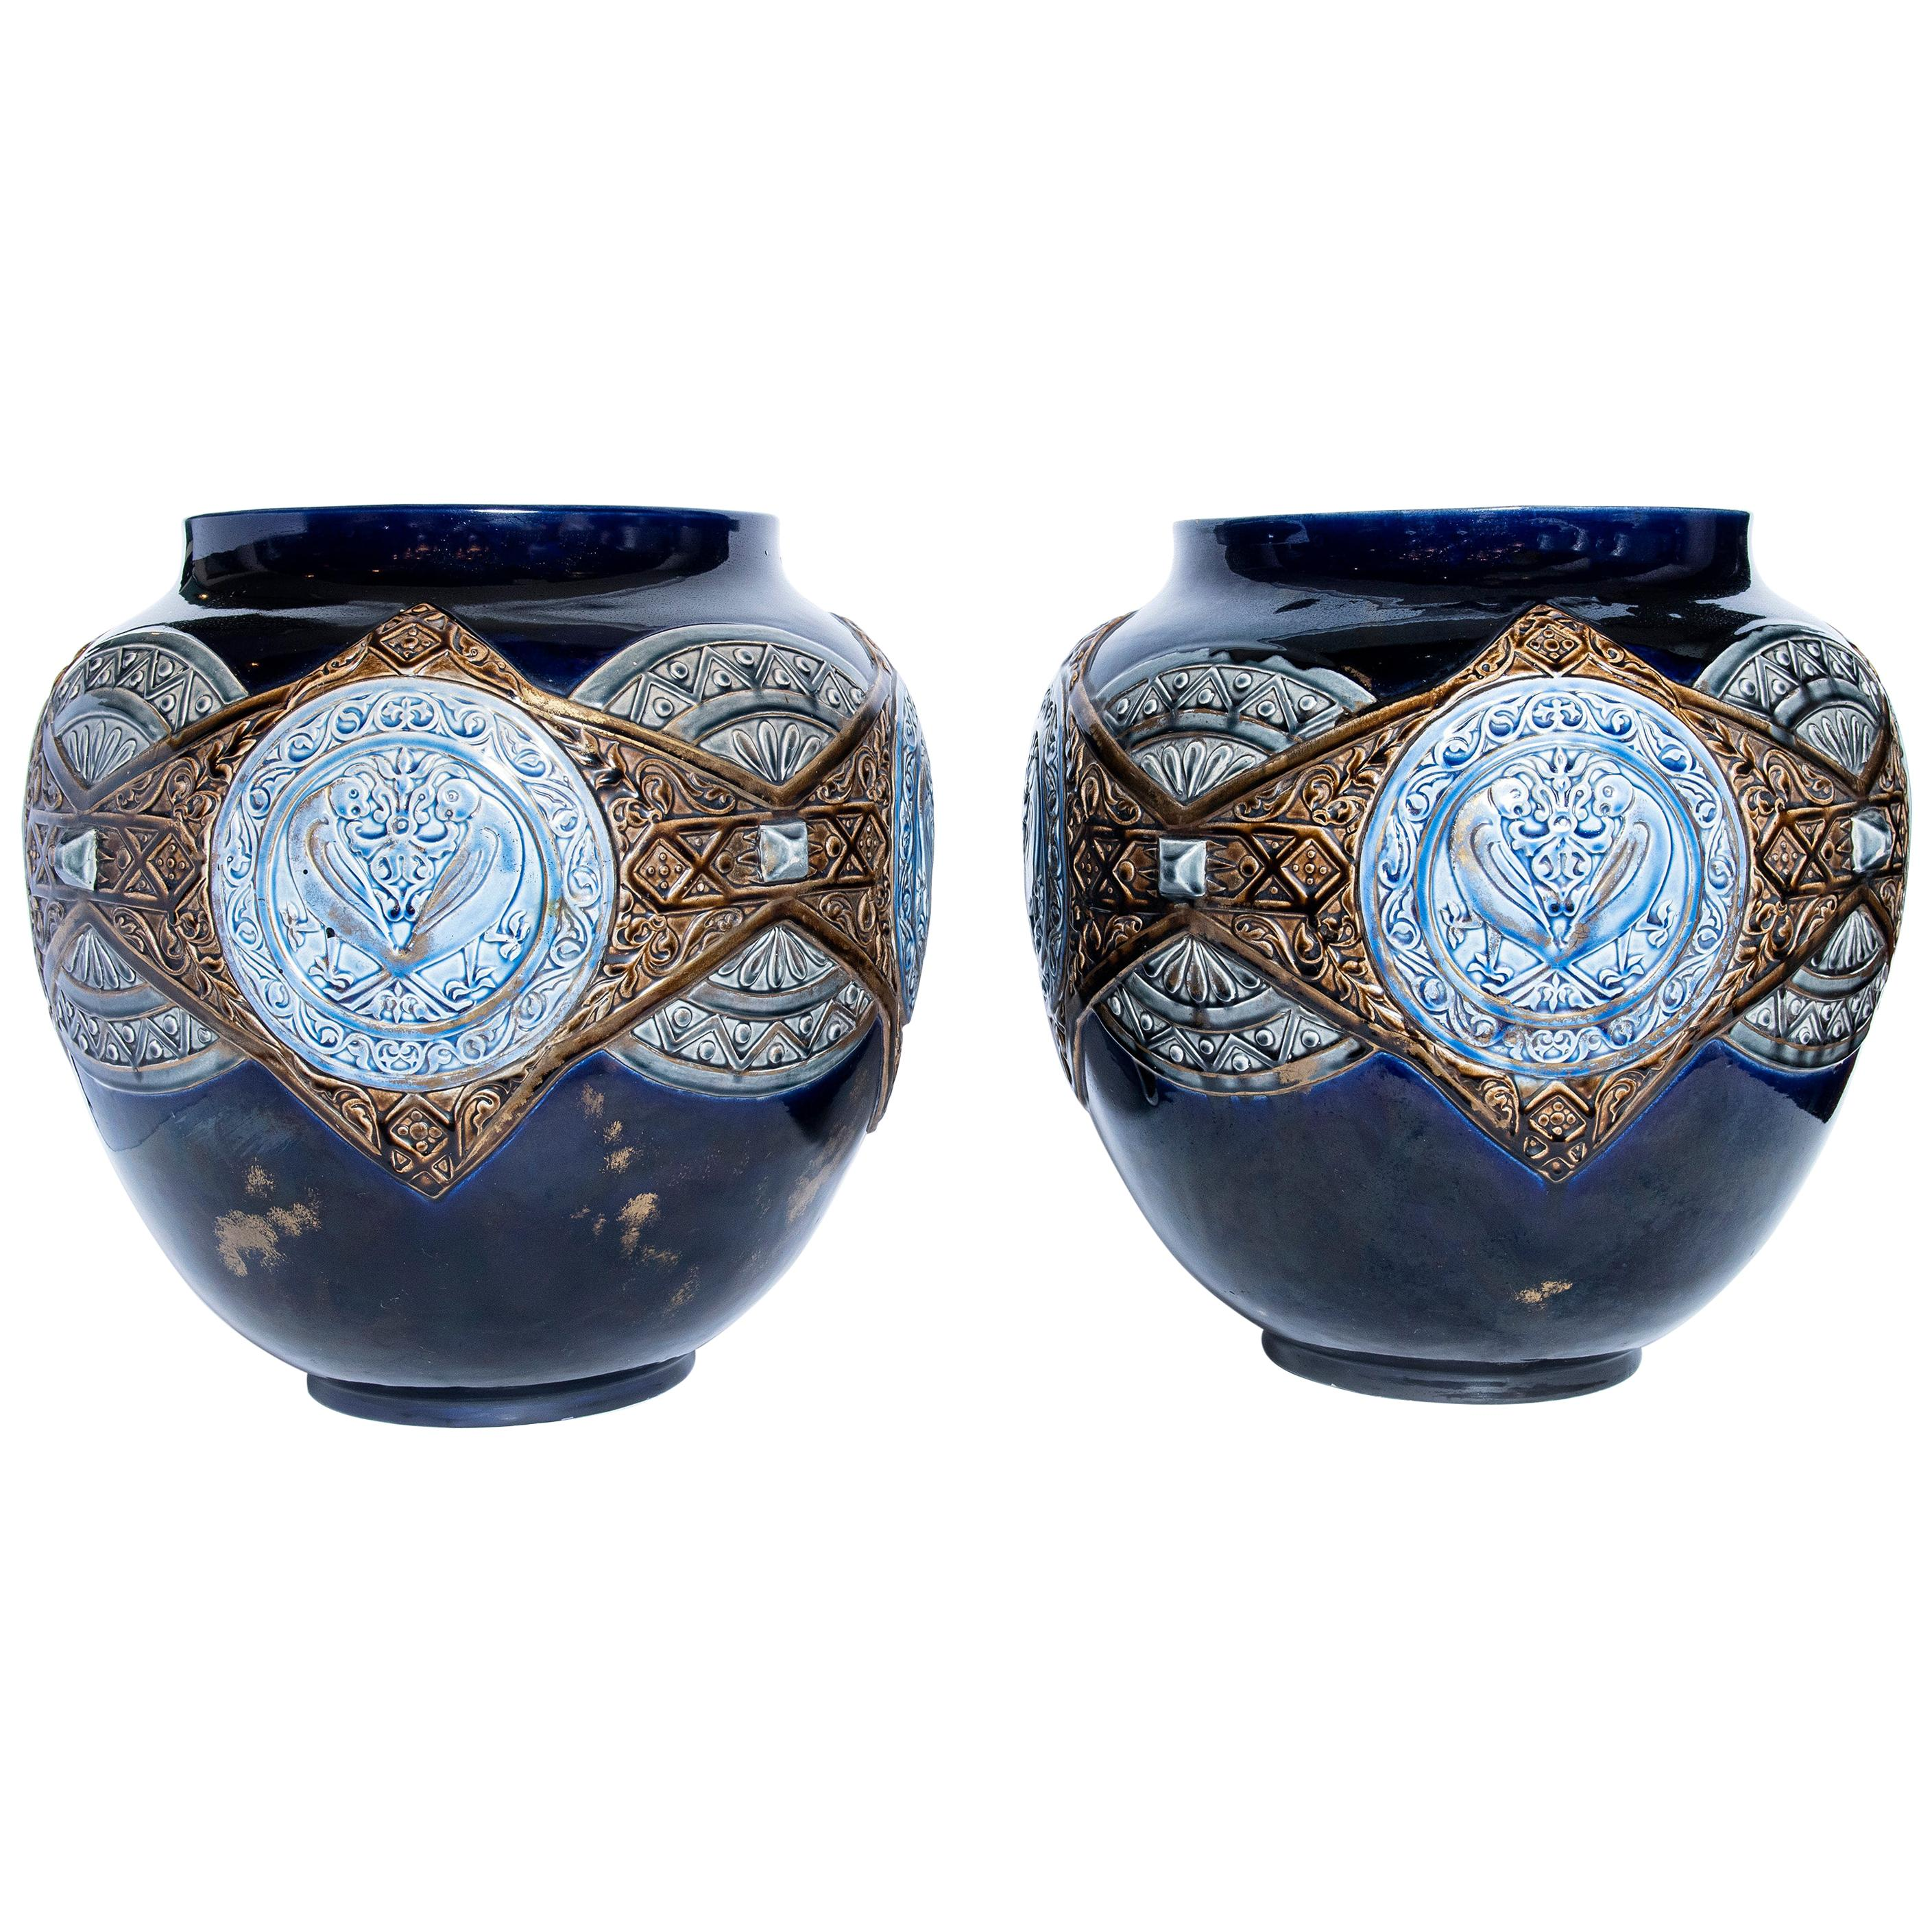 Pair of Enamel Ceramic Planters, France, Late 19th Century